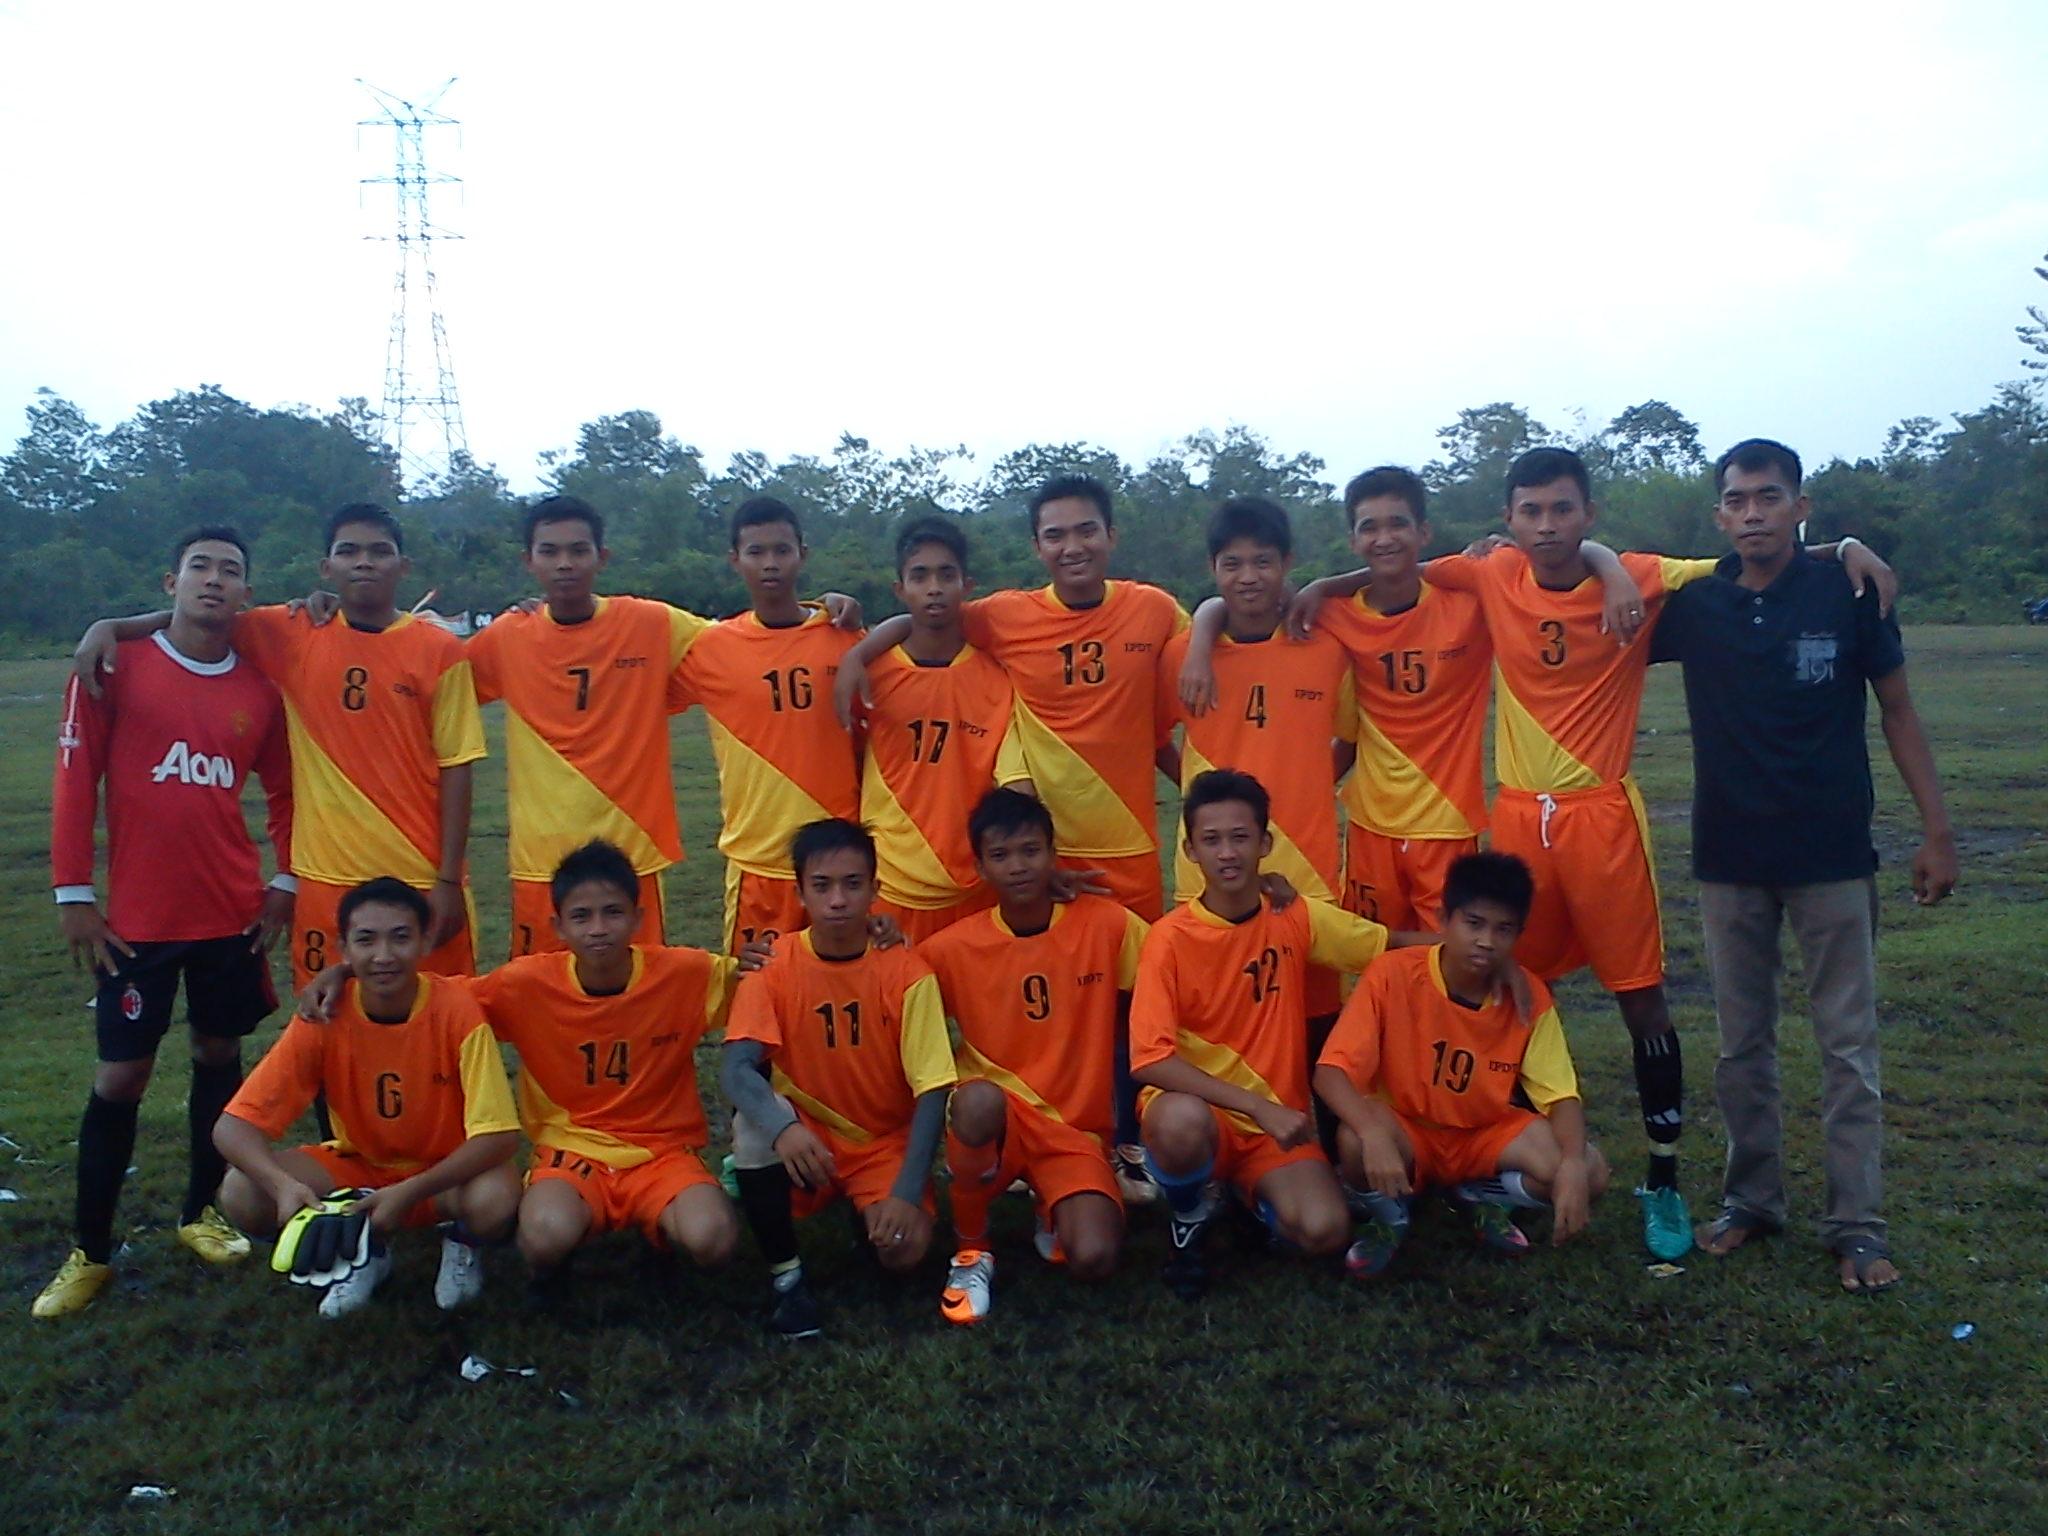 Pembinaan Akhlak Siswa No 39 2008 Hukumunsratacid Inilah Tim Sepakbola Sma Negeri 1 Bangkinang Seberang Dalam Mengikuti